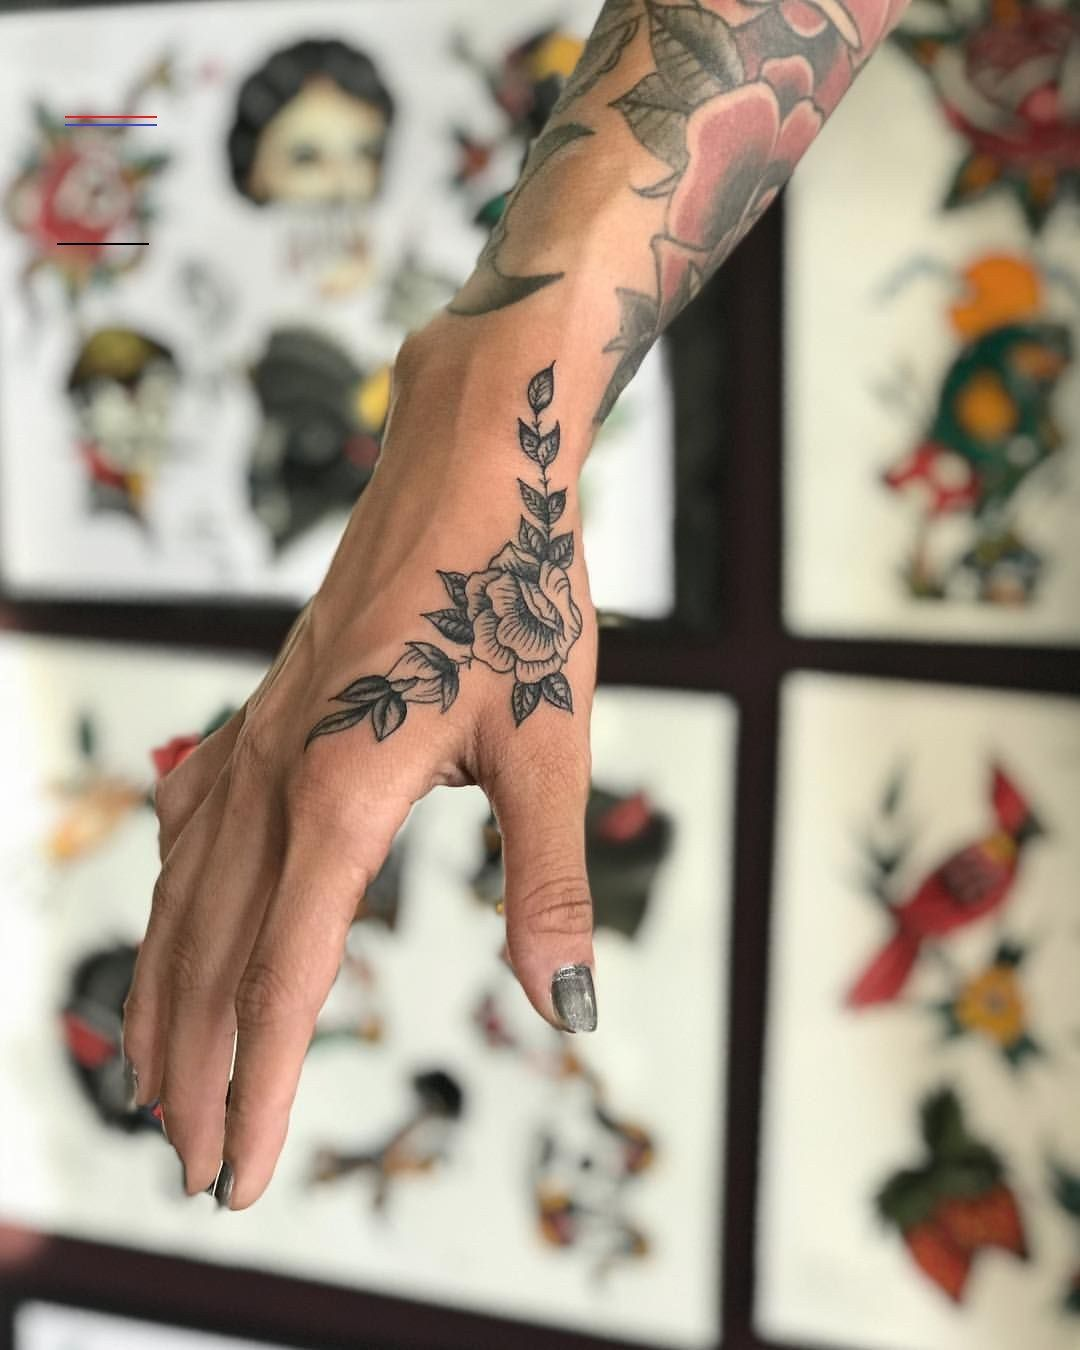 20 Hand Tattoo Ideas From Women Celebrities That Love Ink